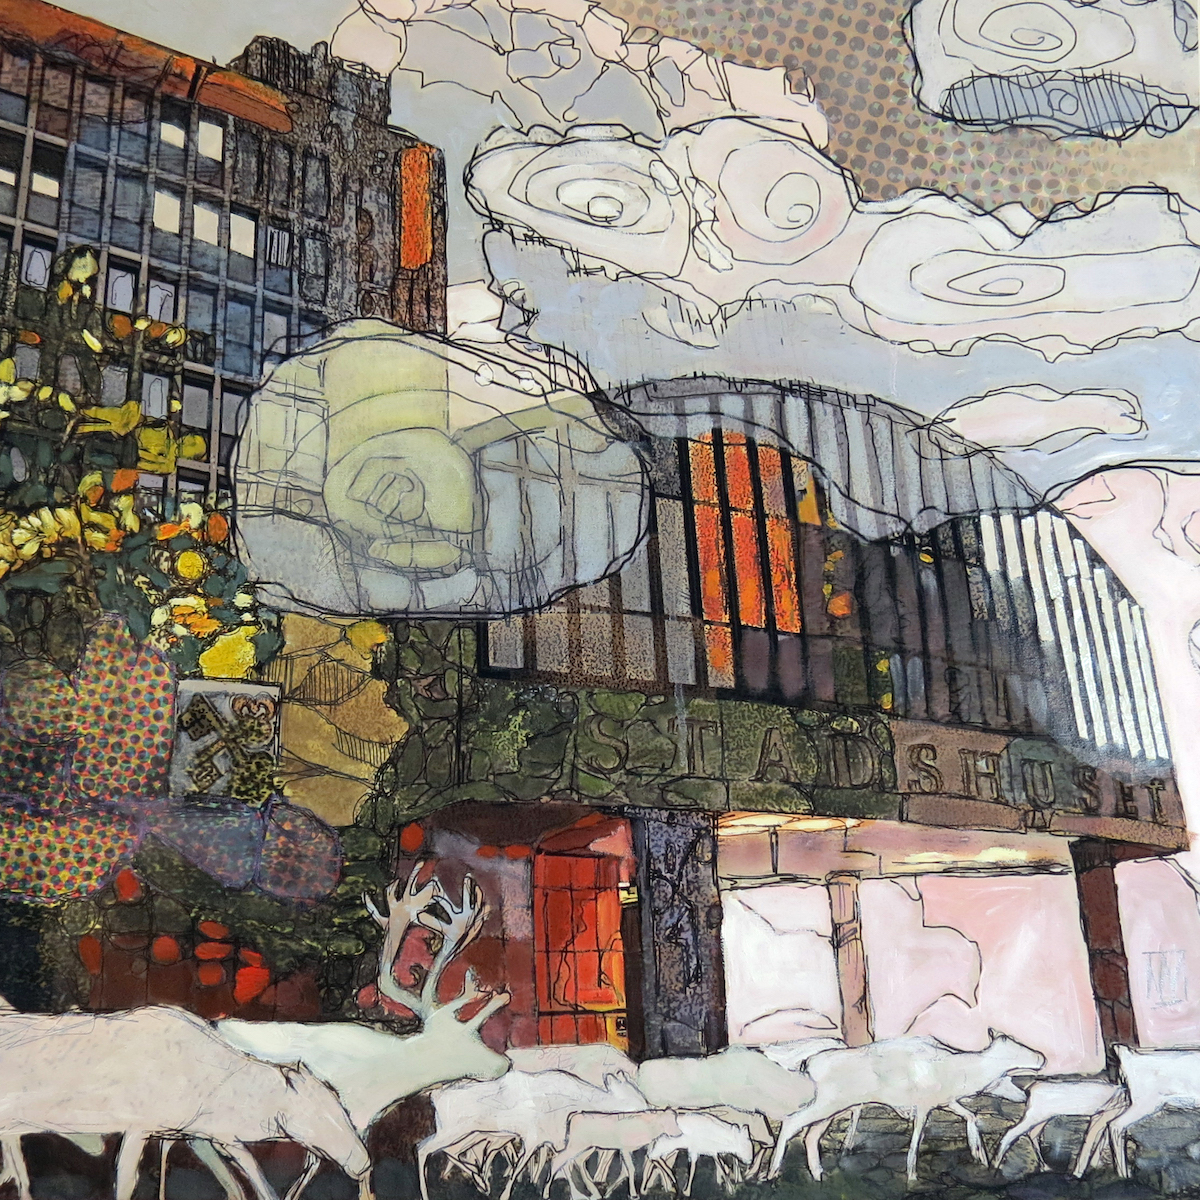 Urban Wikberg Mixed media|Fine Art Print på canvas och måleri 70 x 70 cm 13 000 kr urbanwikberg.se